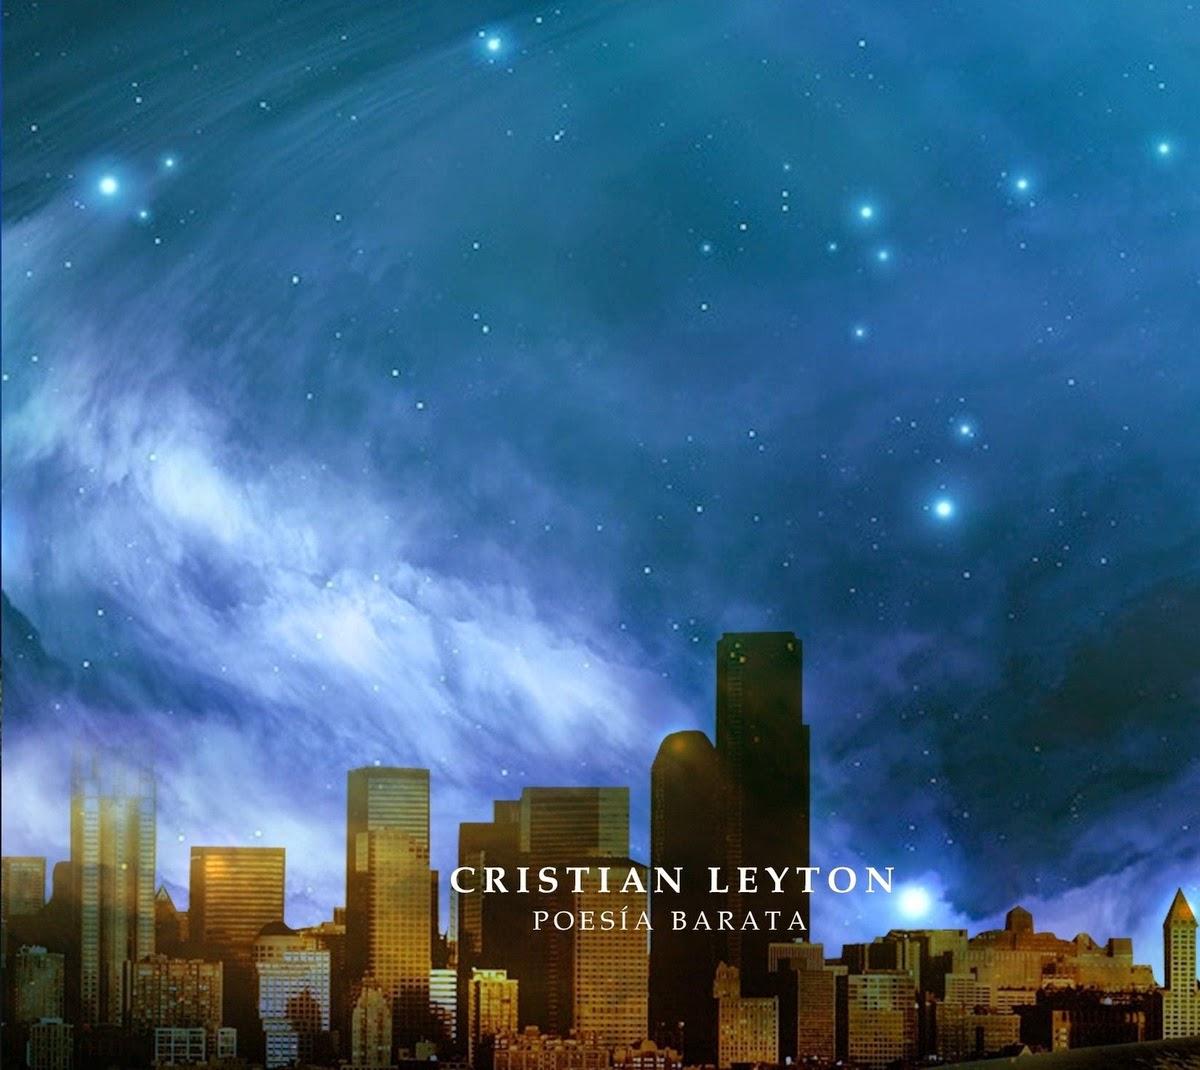 Cristian Leyton - Poesia Barata